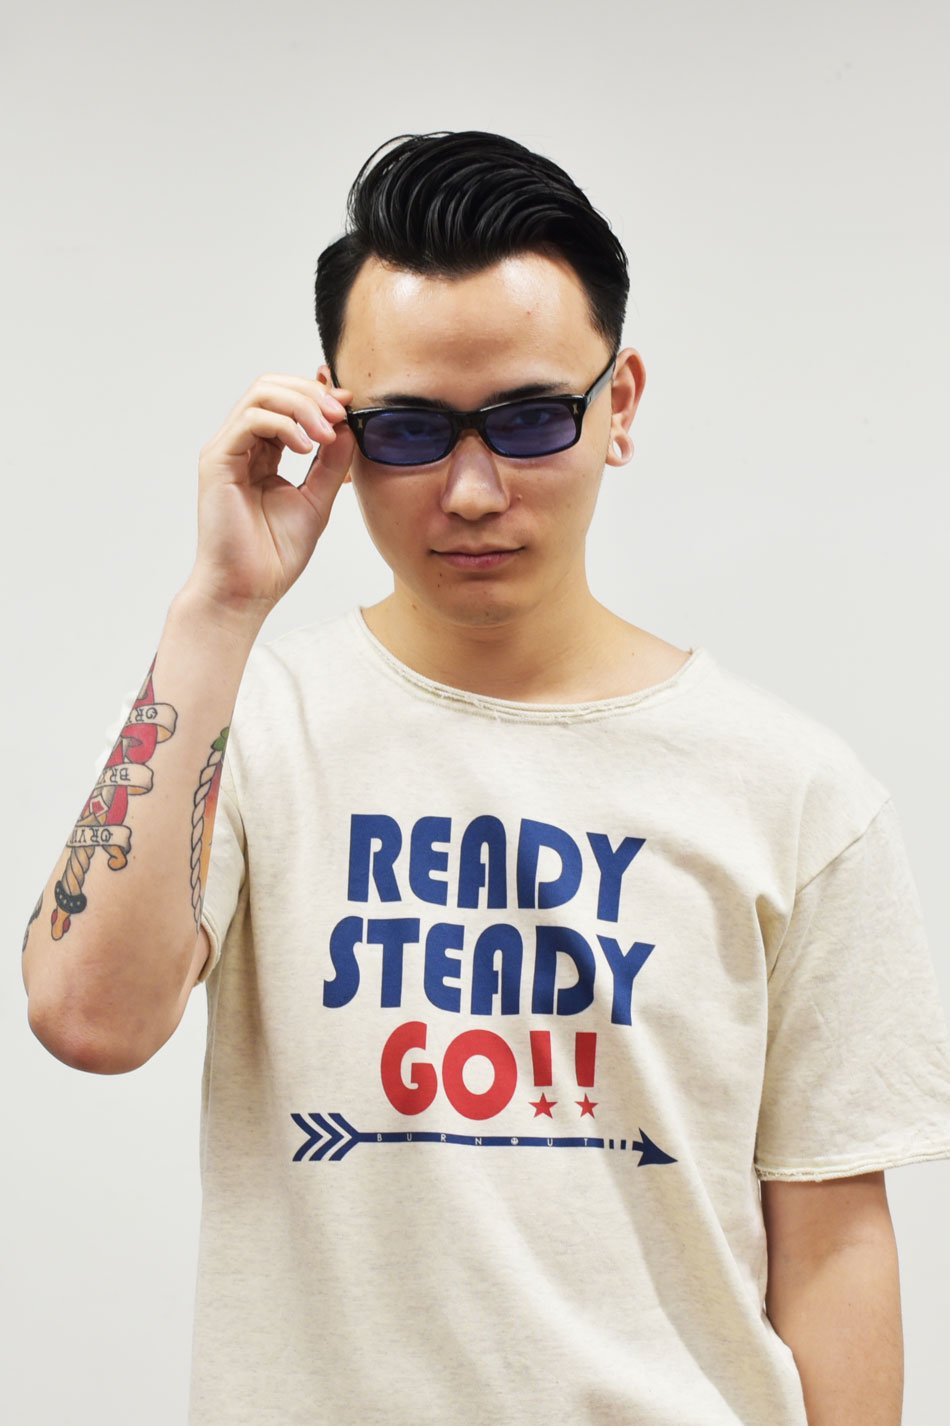 BURNOUT(バーンアウト )【READY STEADY GO !! 】ショートスリーブカットソー / オートミール